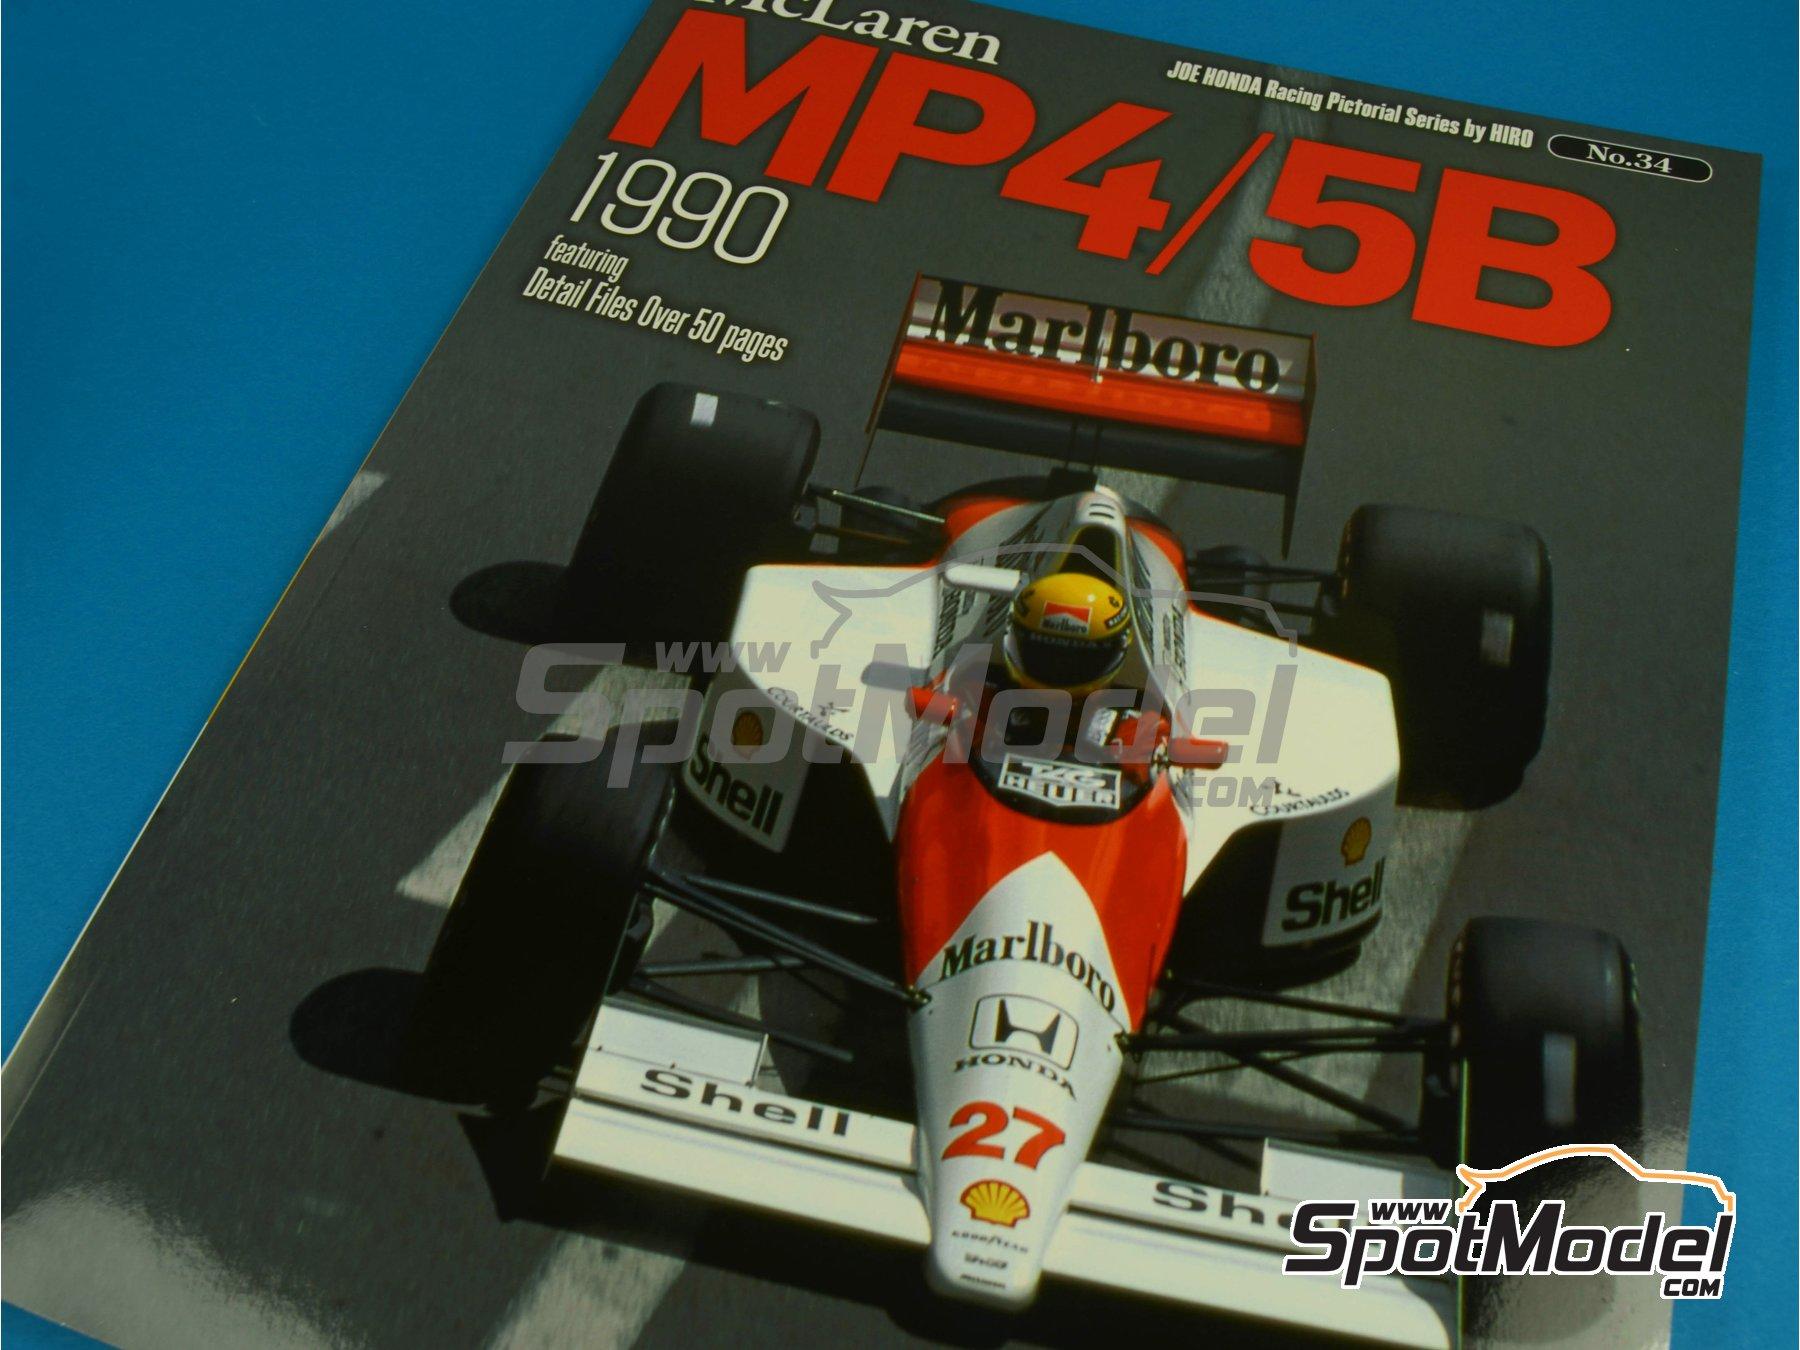 Image 1: JOE HONDA Racing Pictorial Series - MP4/5B - FIA Formula 1 World Championship 1990 | Reference / walkaround book manufactured by Model Factory Hiro (ref.MFH-JH34)